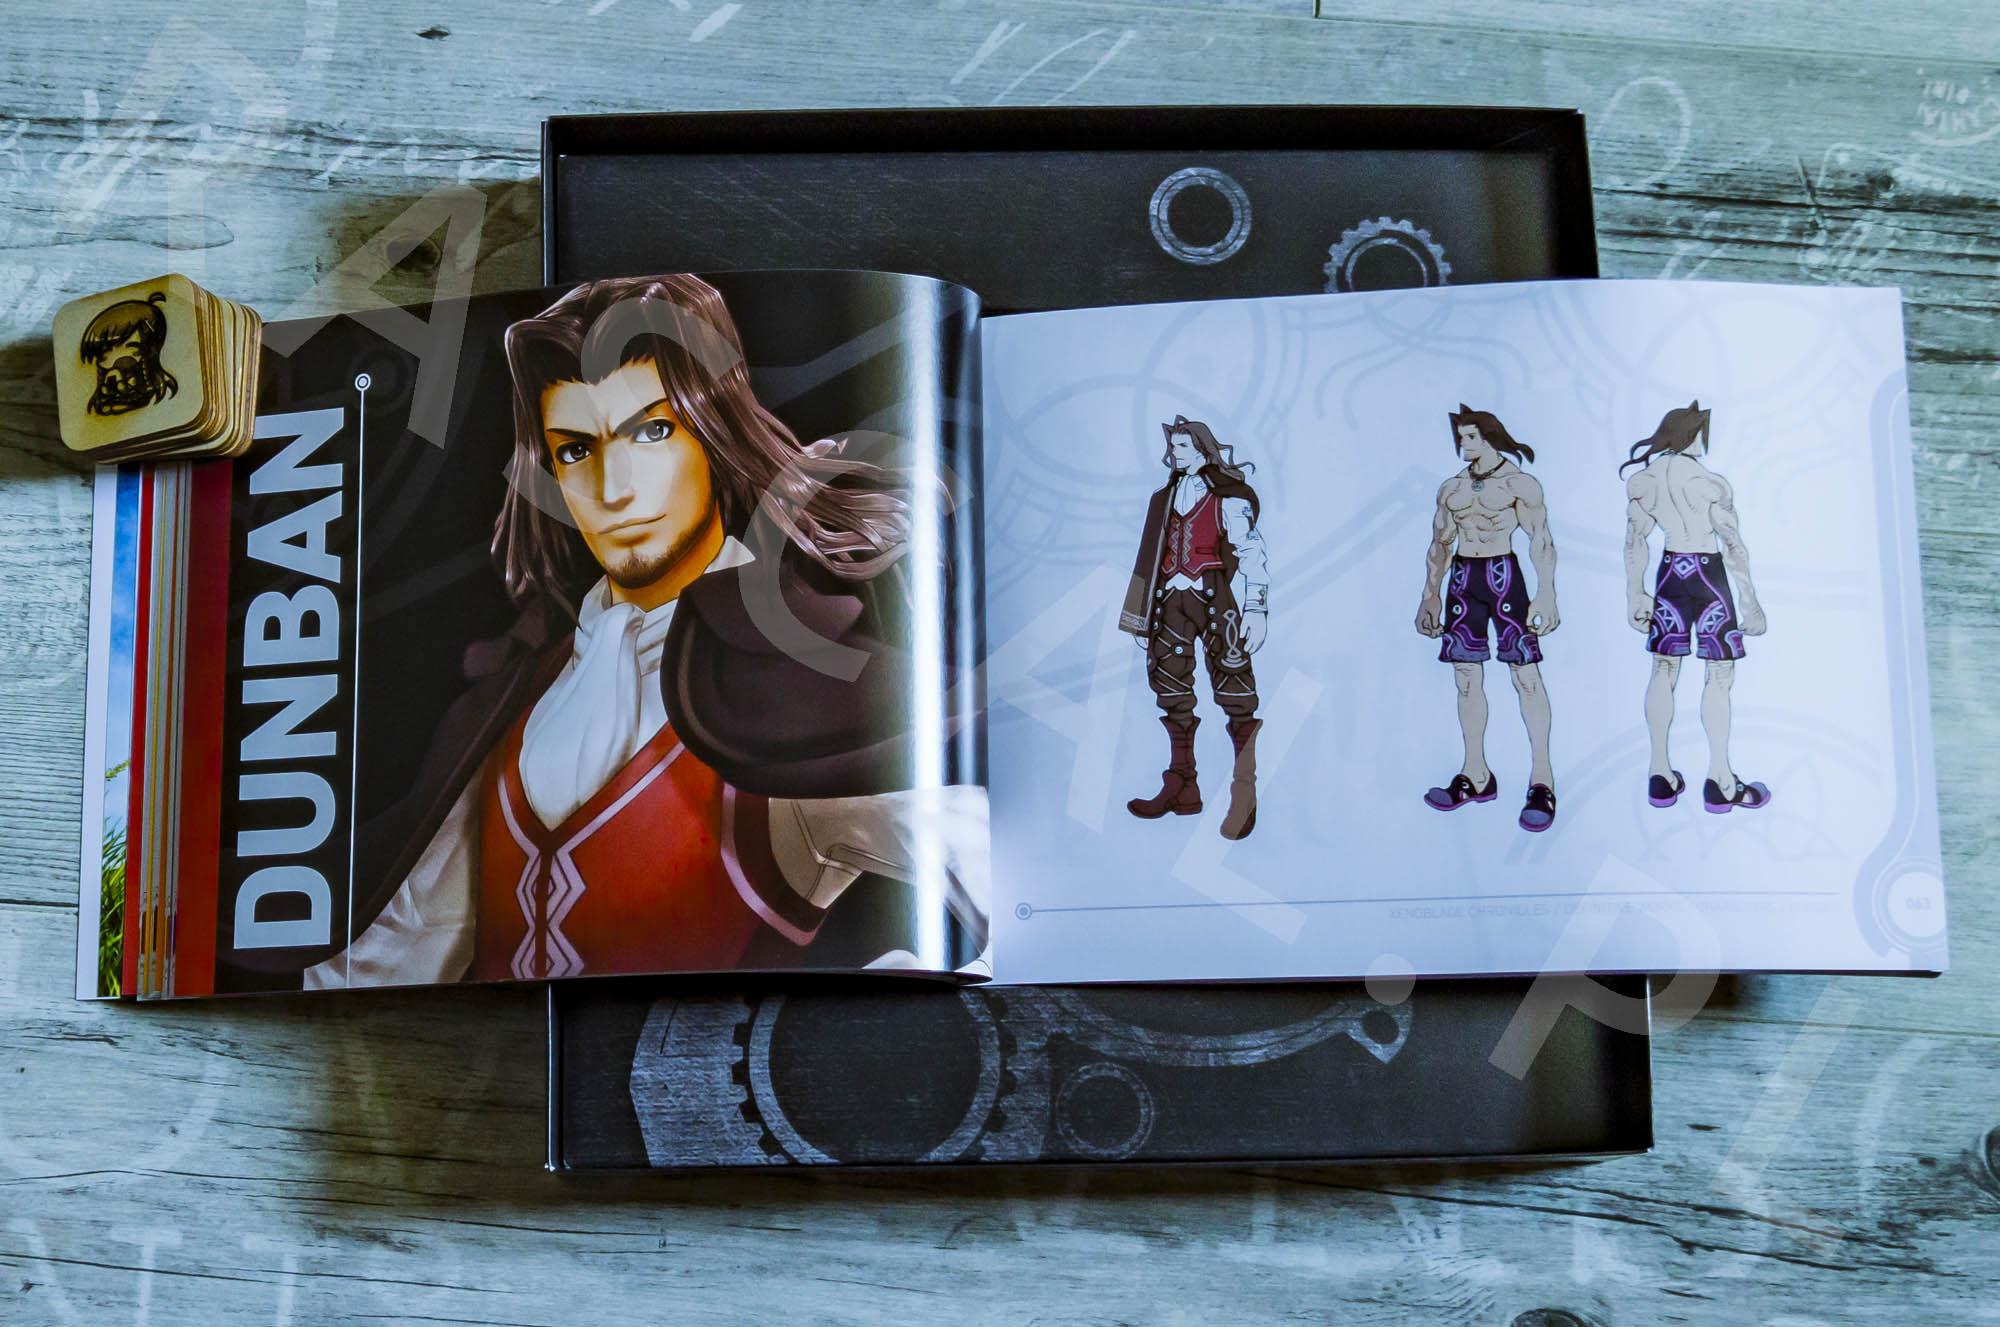 Xenoblade Chronicles Definitive Edition Collectors Set - Artbook - 07 - Dunban